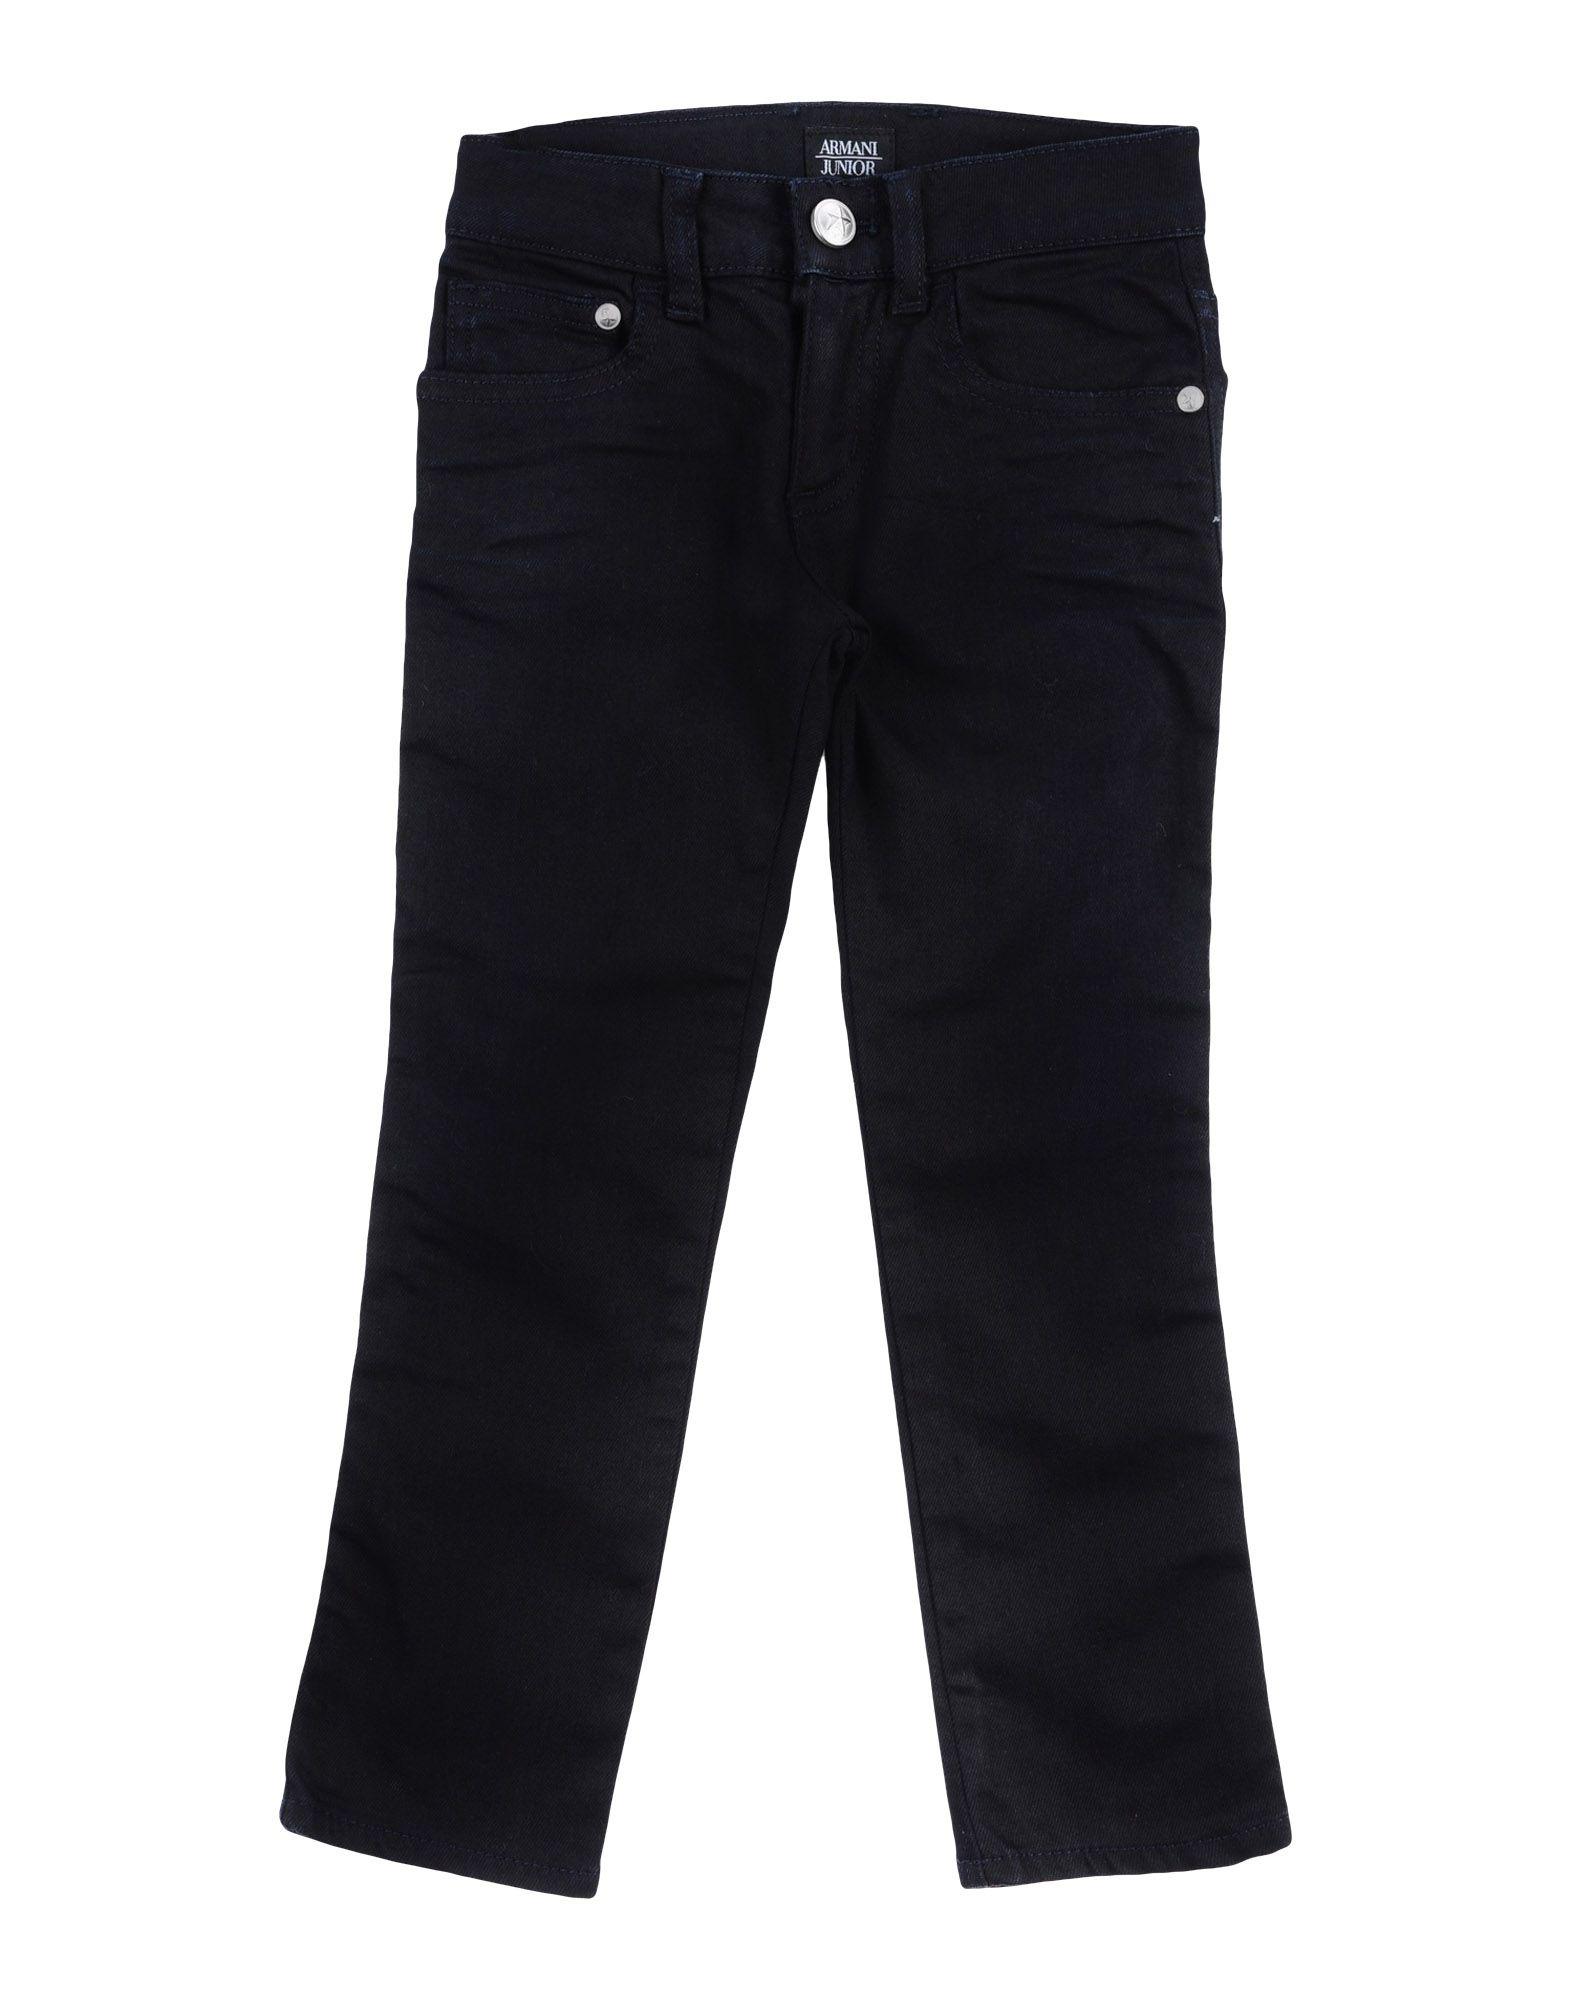 ARMANI JUNIOR Denim pants - Item 42636853